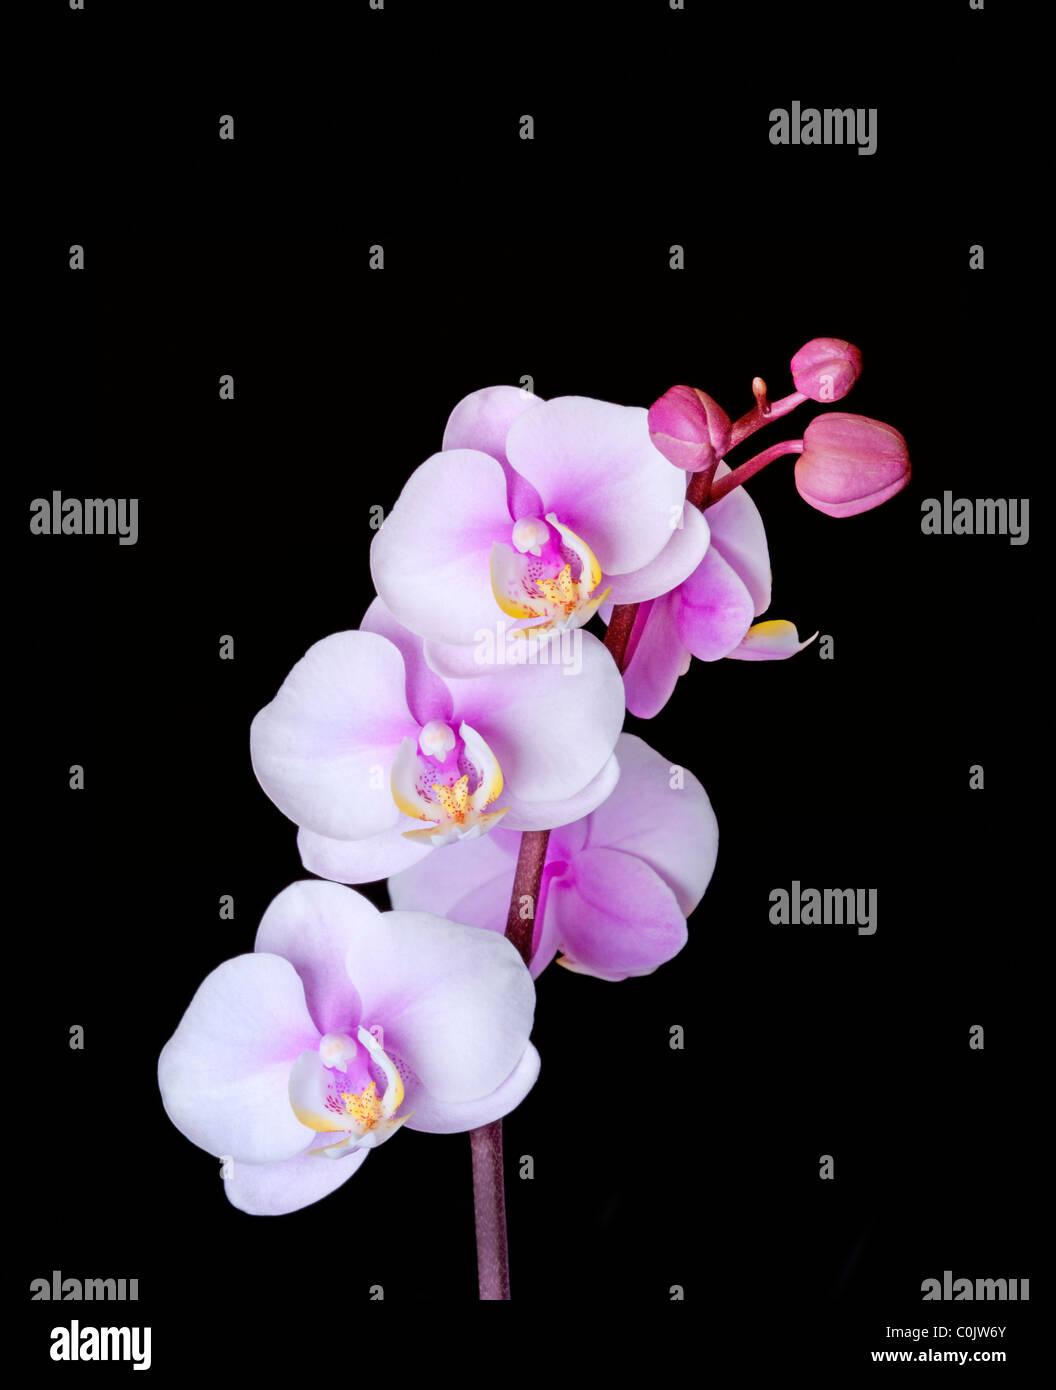 Closeup of Phalaenopsis orchid - Stock Image